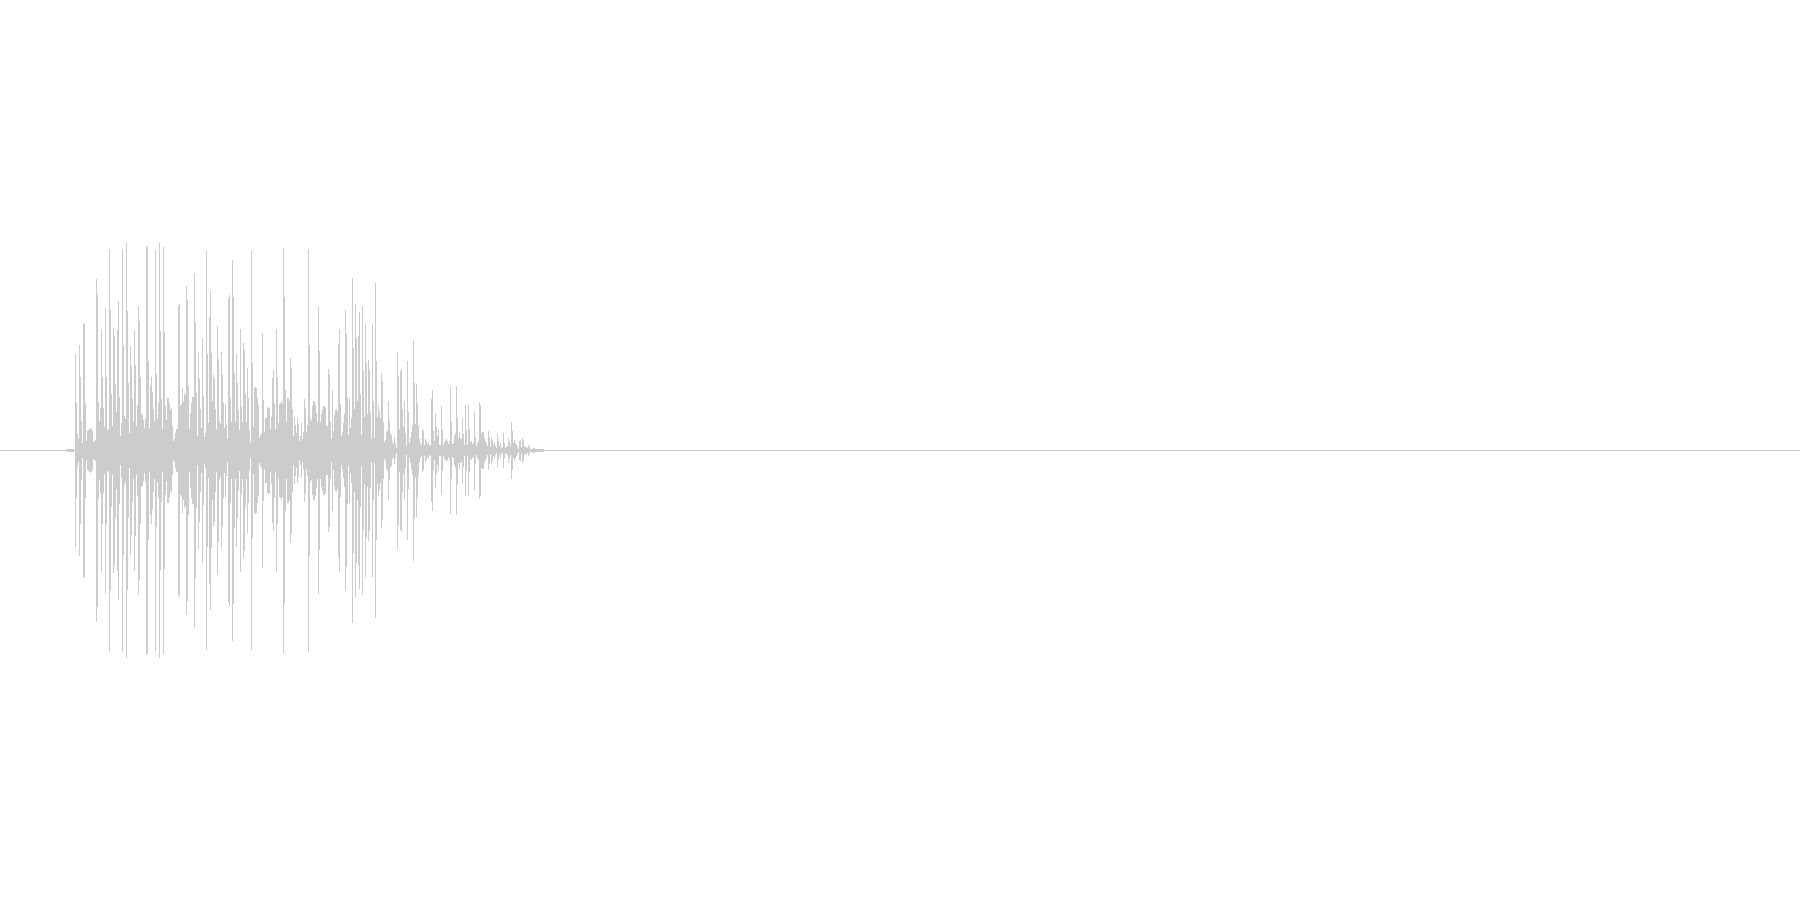 8bitの火炎 ボワッの未再生の波形